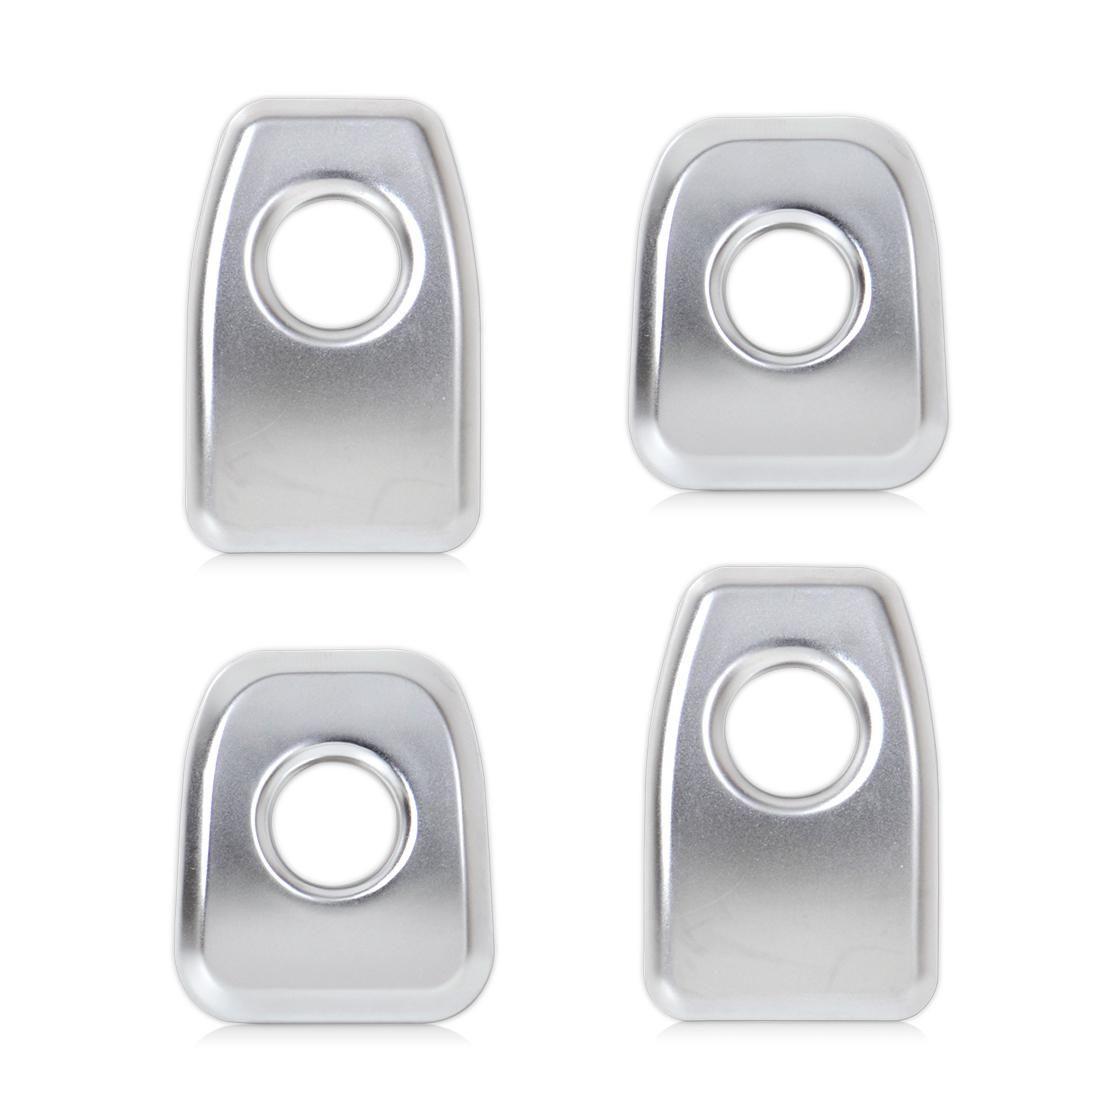 car door lock knob. CITALL 4pcs Matt Chrome Car Interior Door Lock Pin Knob Grommet Ferrule Covers Button Trim For